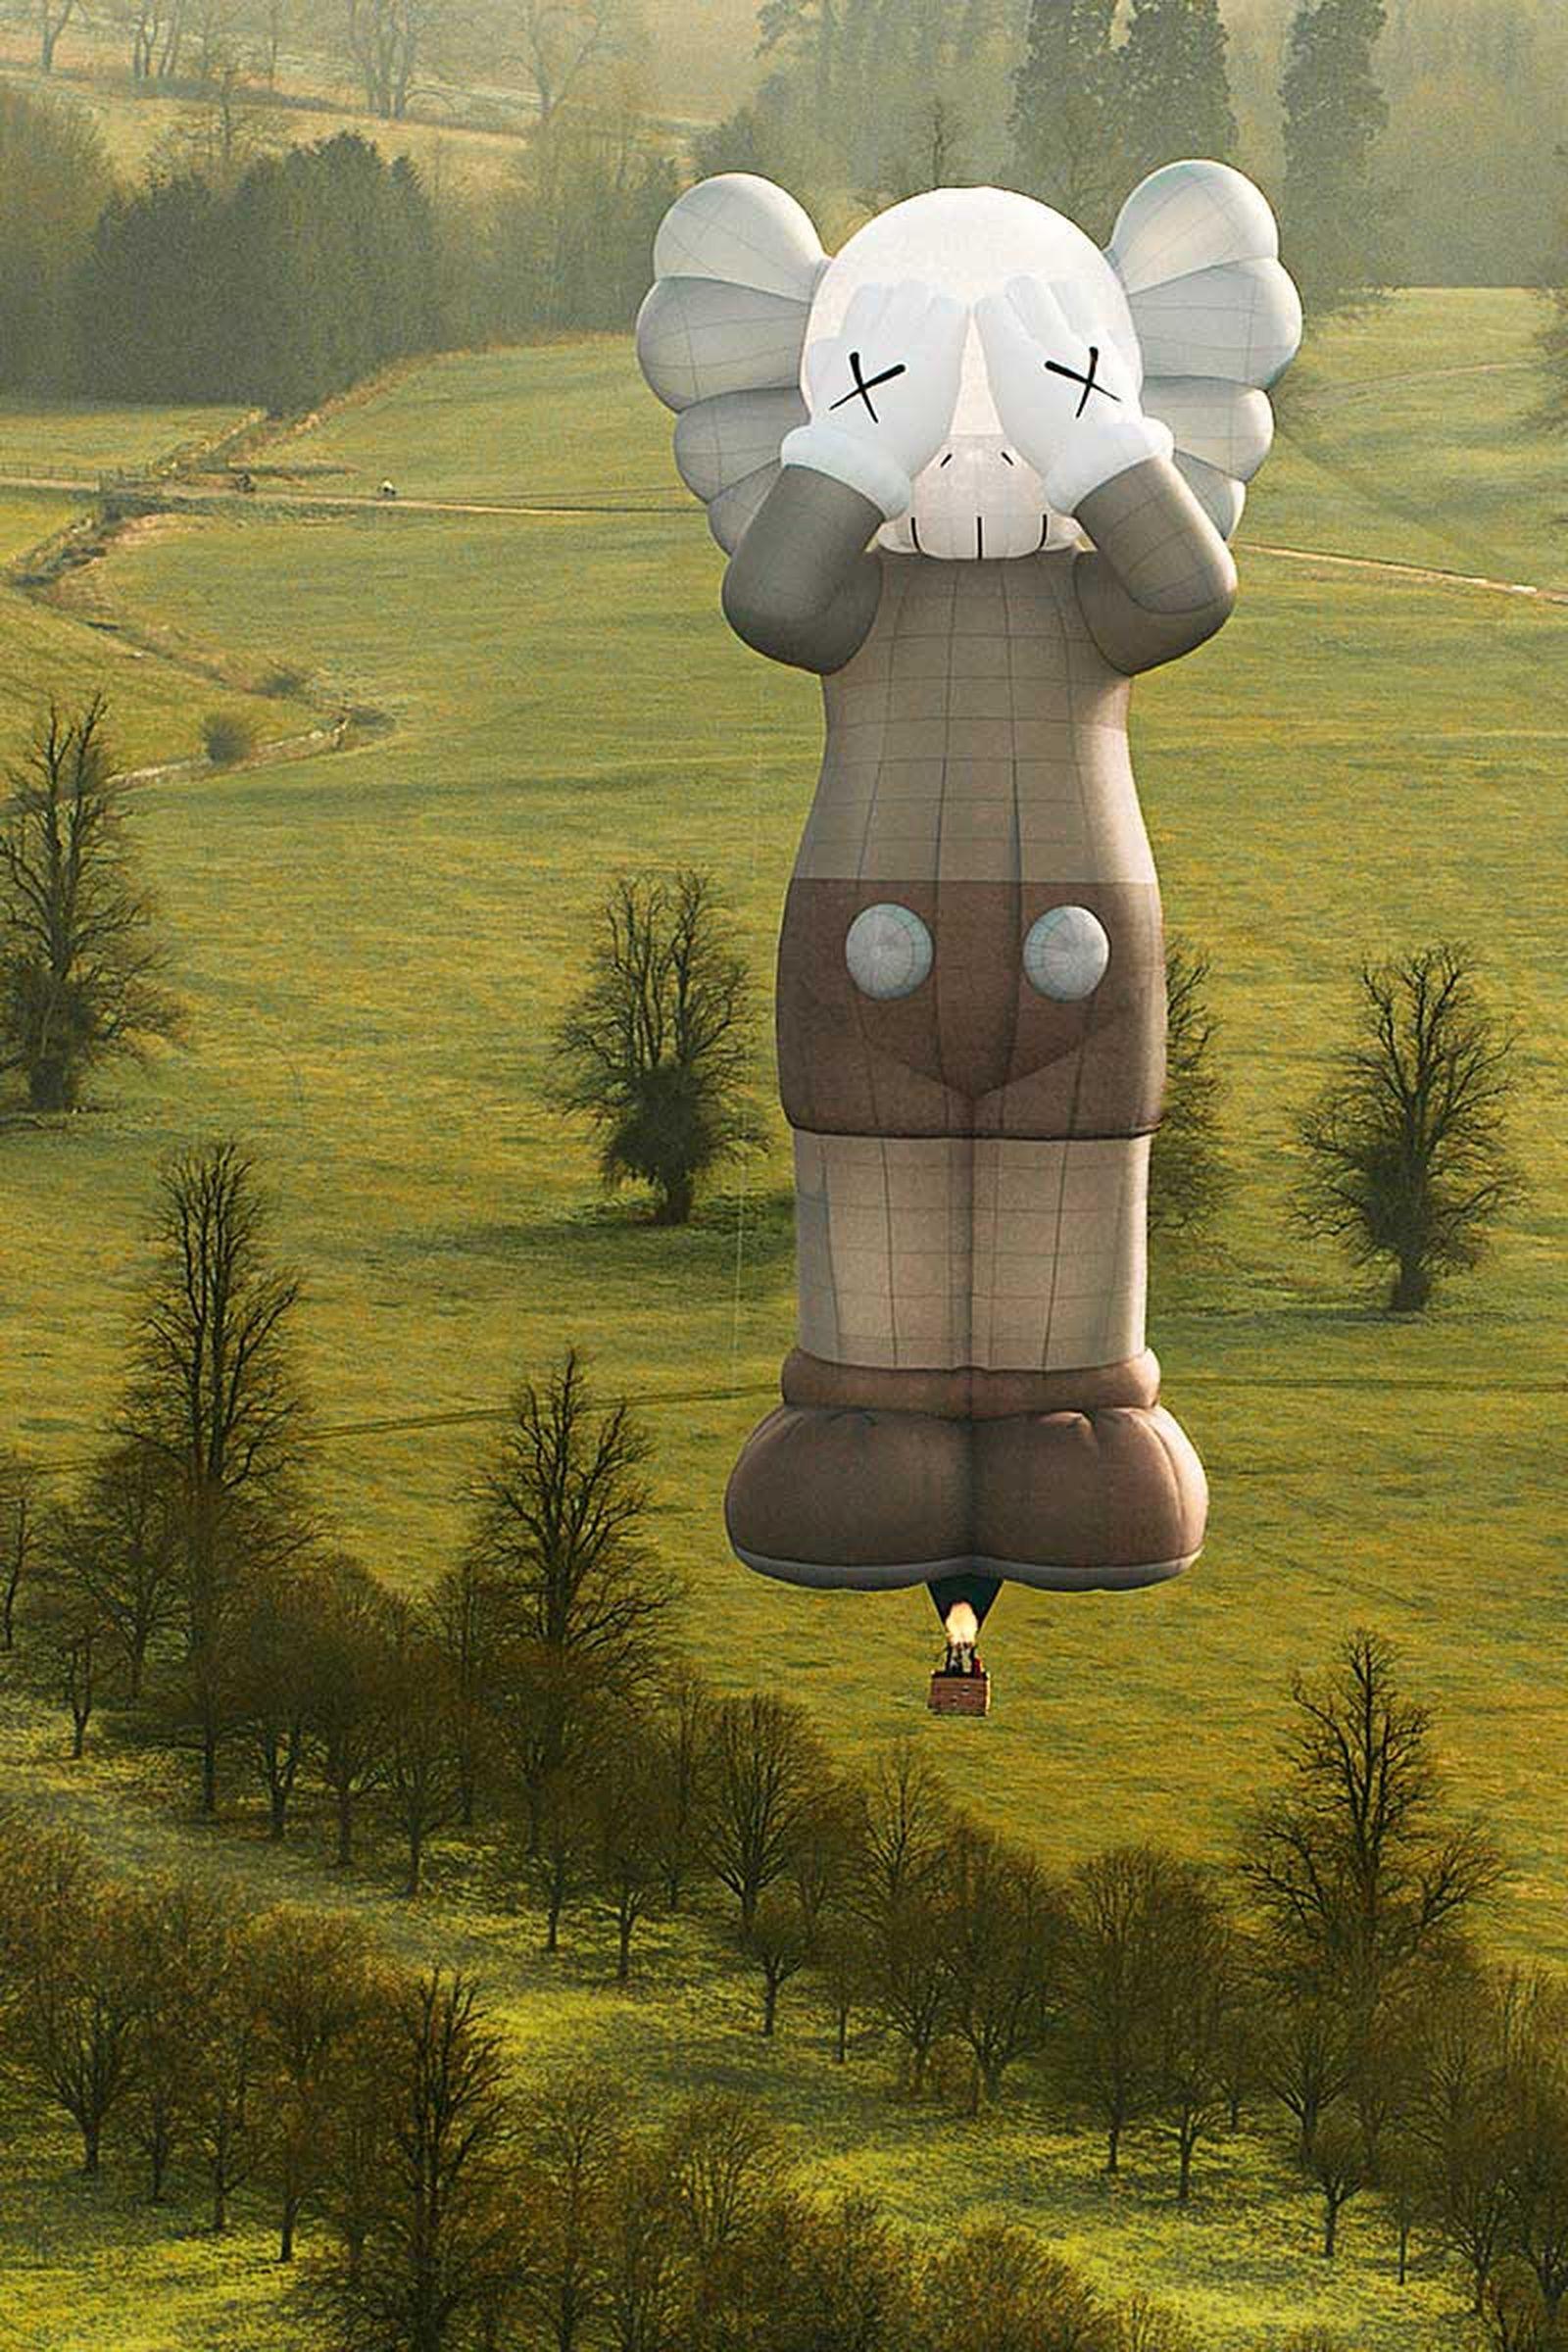 kaws-holiday-bristol-hot-air-balloon-companion-(19)